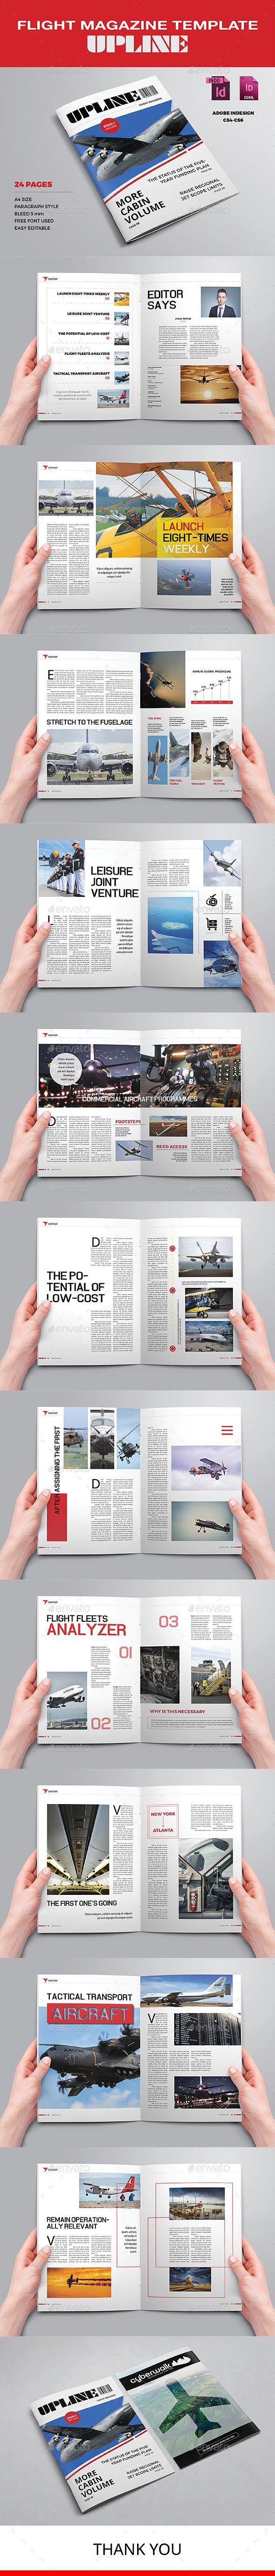 Flight Magazine Template - Upline